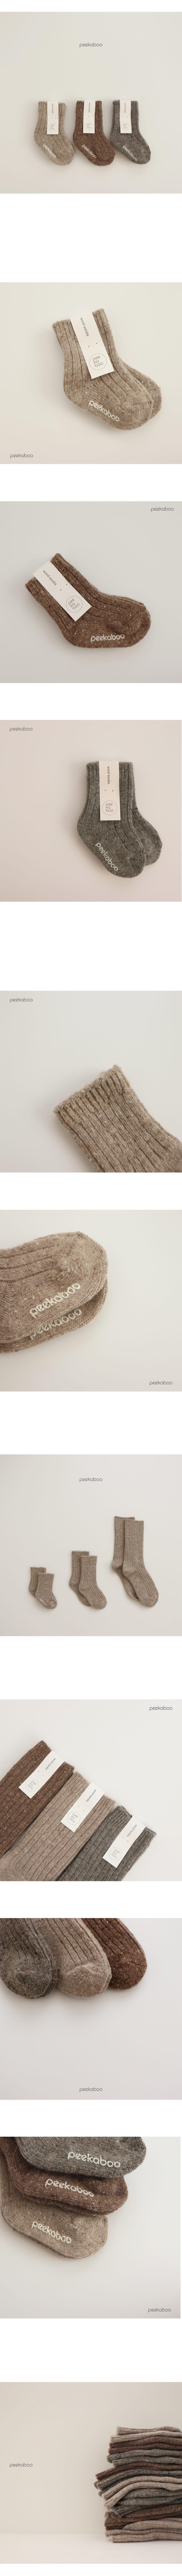 PEEKABOO - Korean Children Fashion - #Kfashion4kids - Peekawool Socks [set of 3] - 2